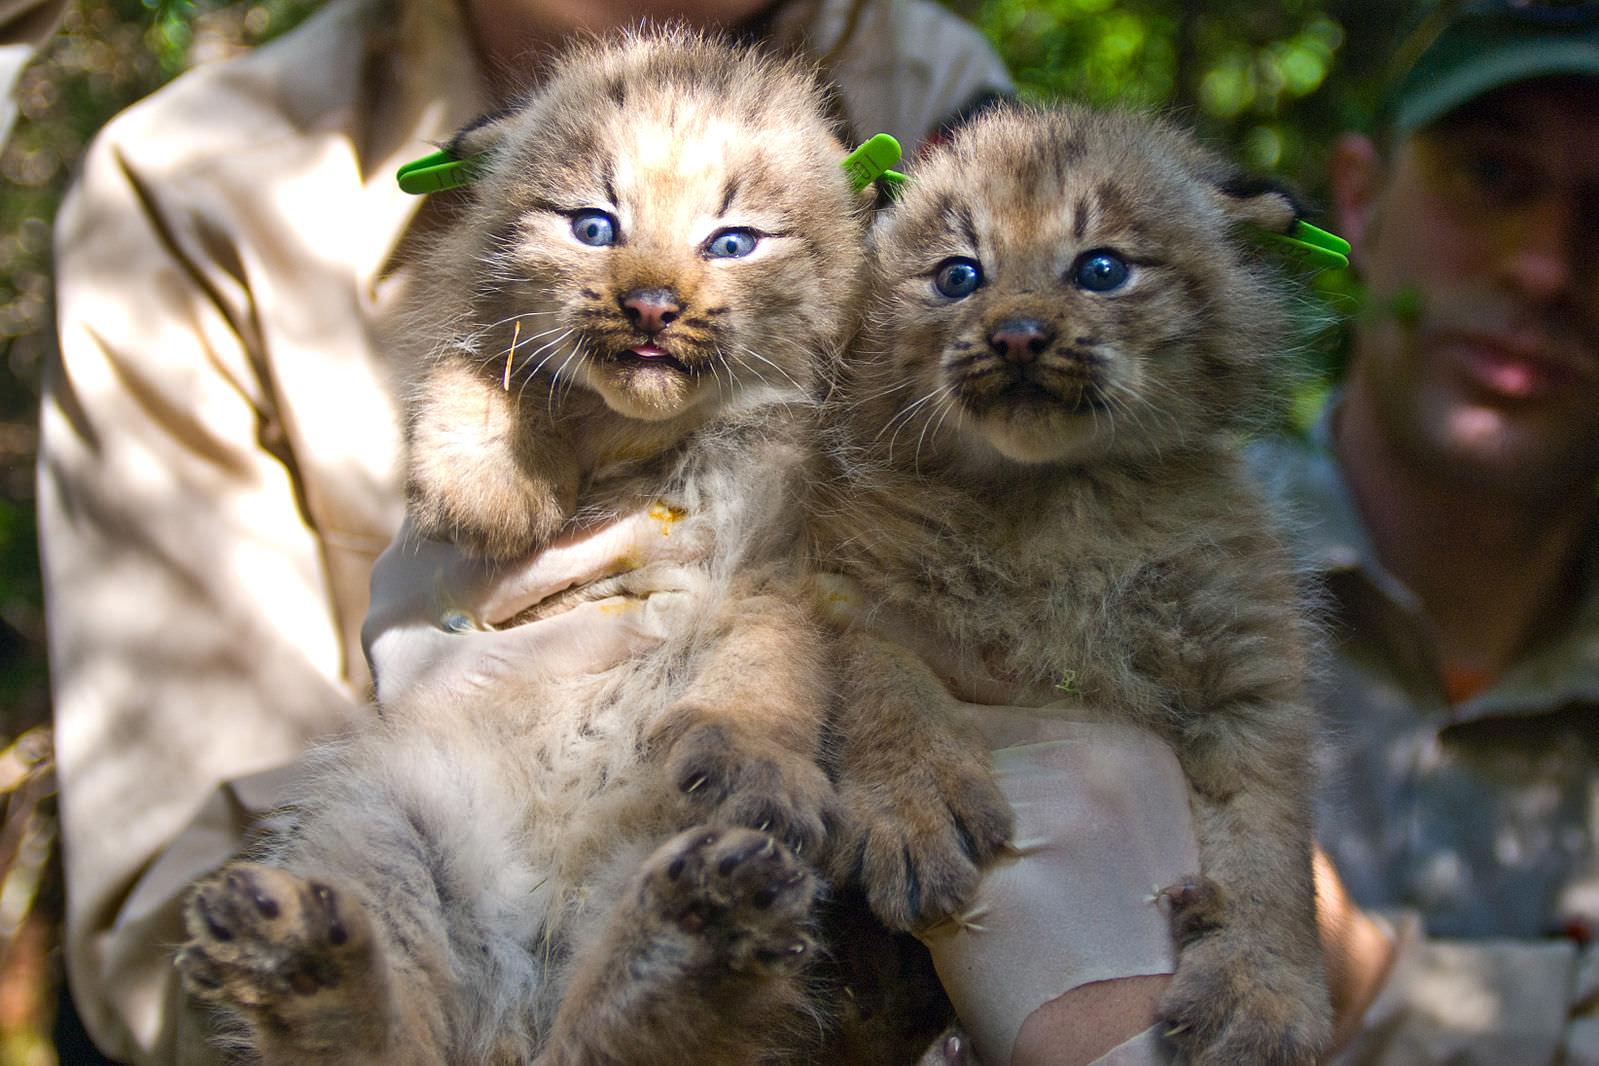 Two_Canada_Lynx_Kittens